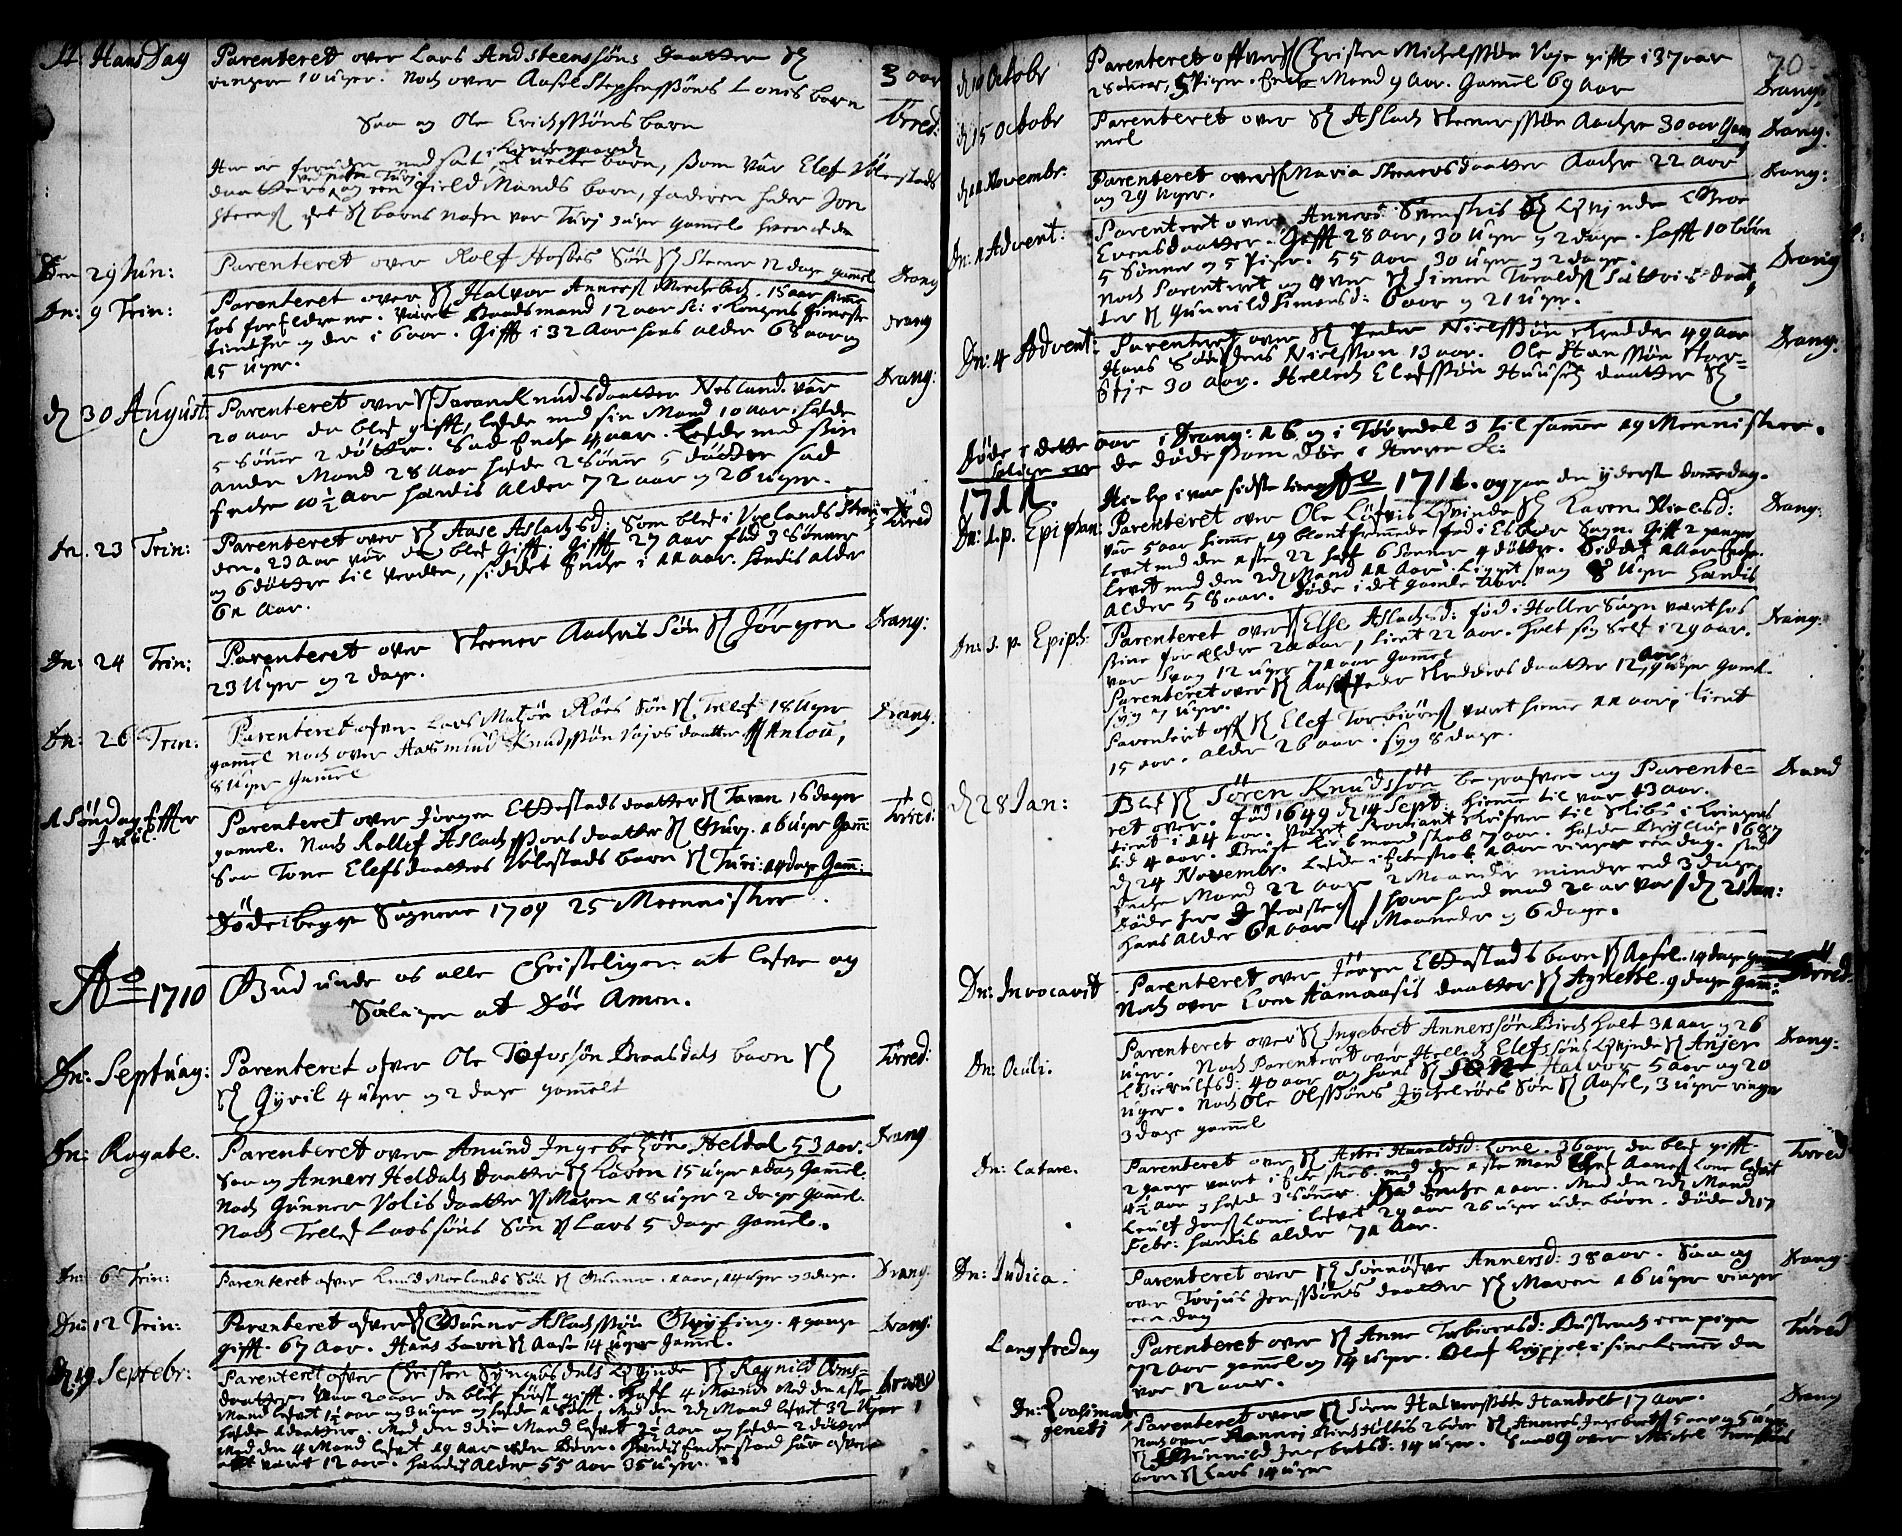 SAKO, Drangedal kirkebøker, F/Fa/L0001: Ministerialbok nr. 1, 1697-1767, s. 70